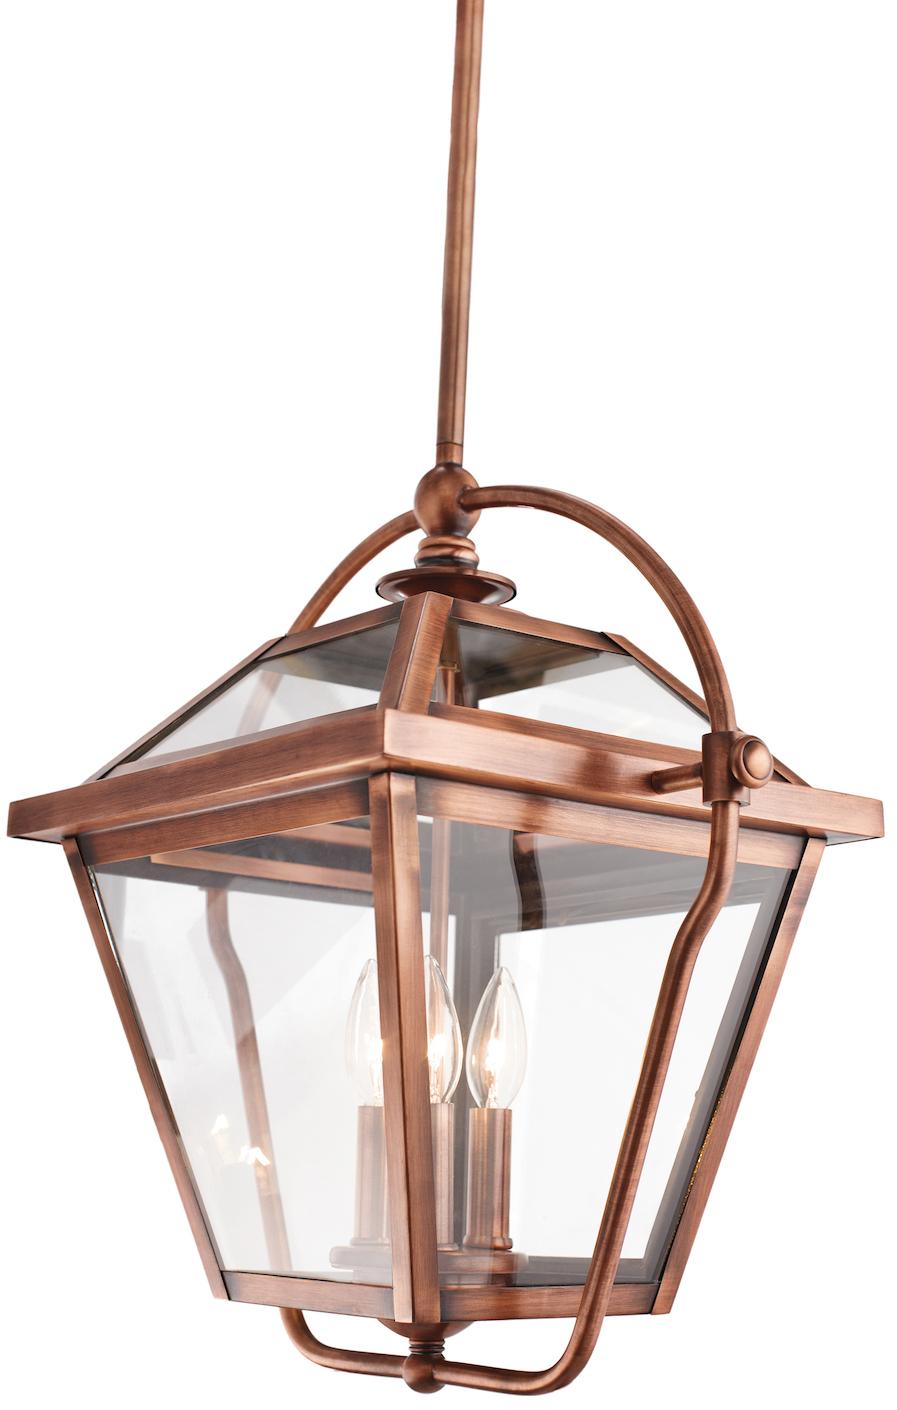 Kichler Antique Copper Ryegate 3 Bulb Indoor Pendant With